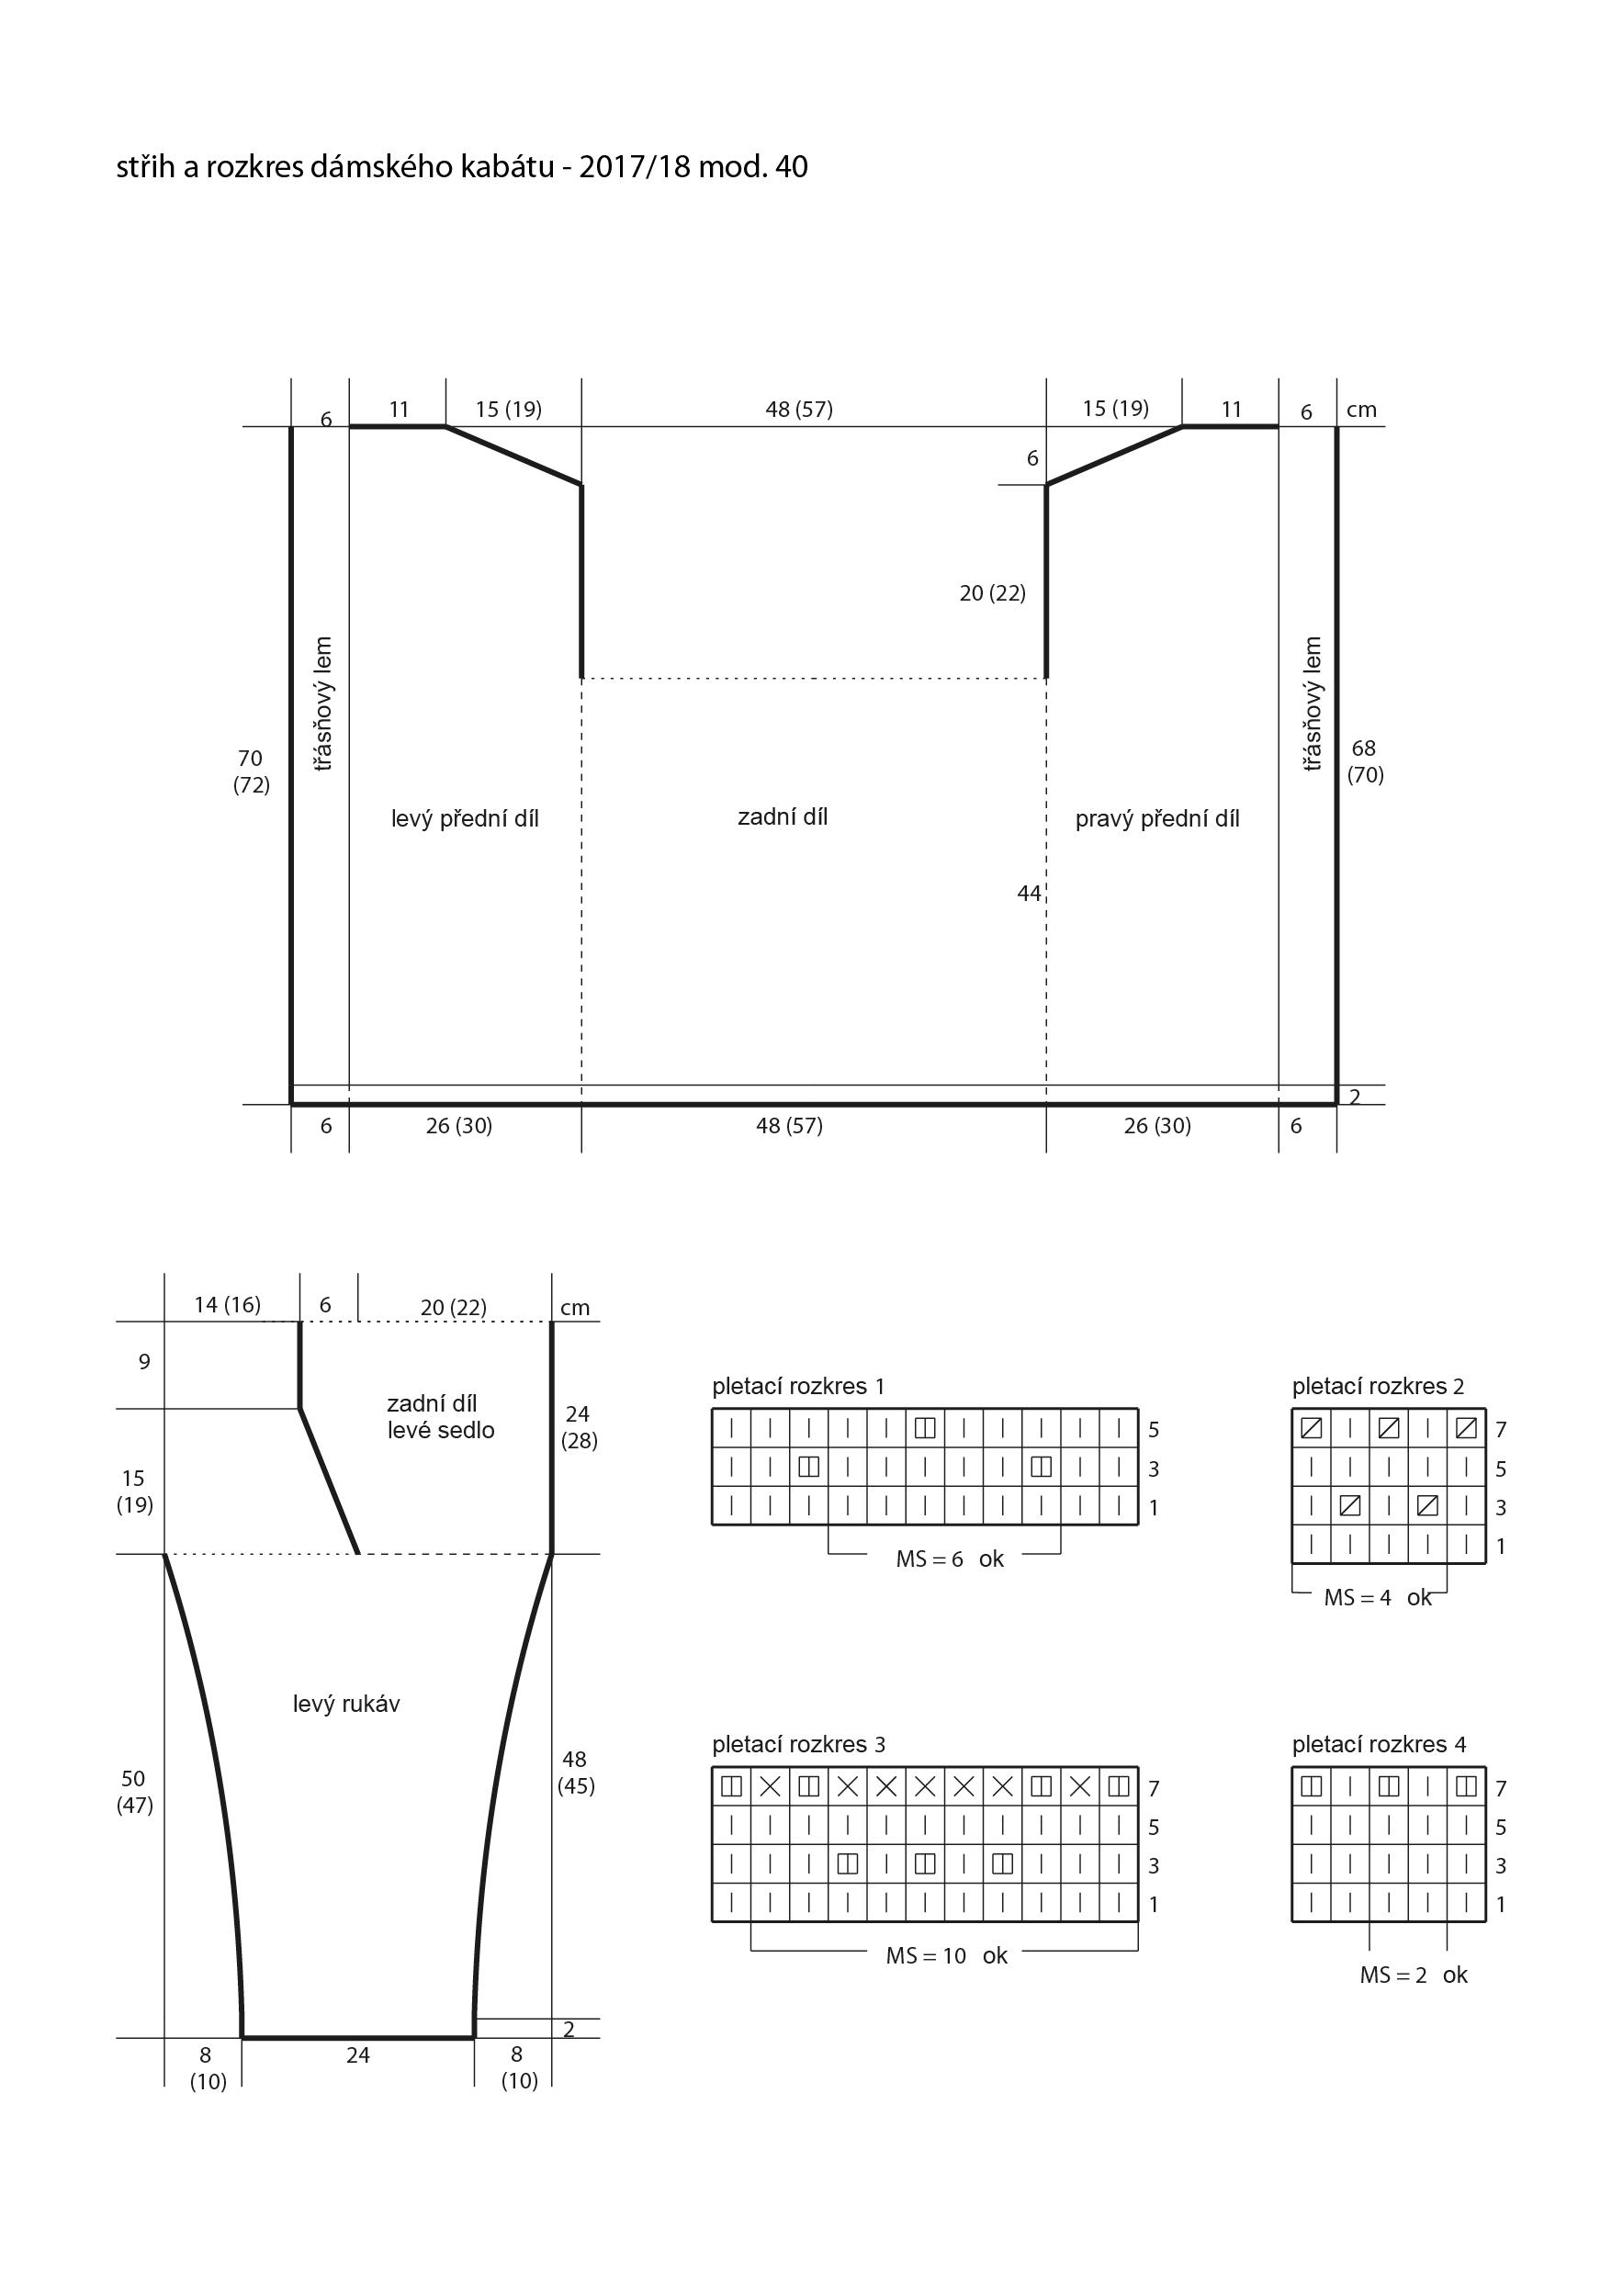 2017-2018 model 40 střih a rozkres dámského pleteného kabátu